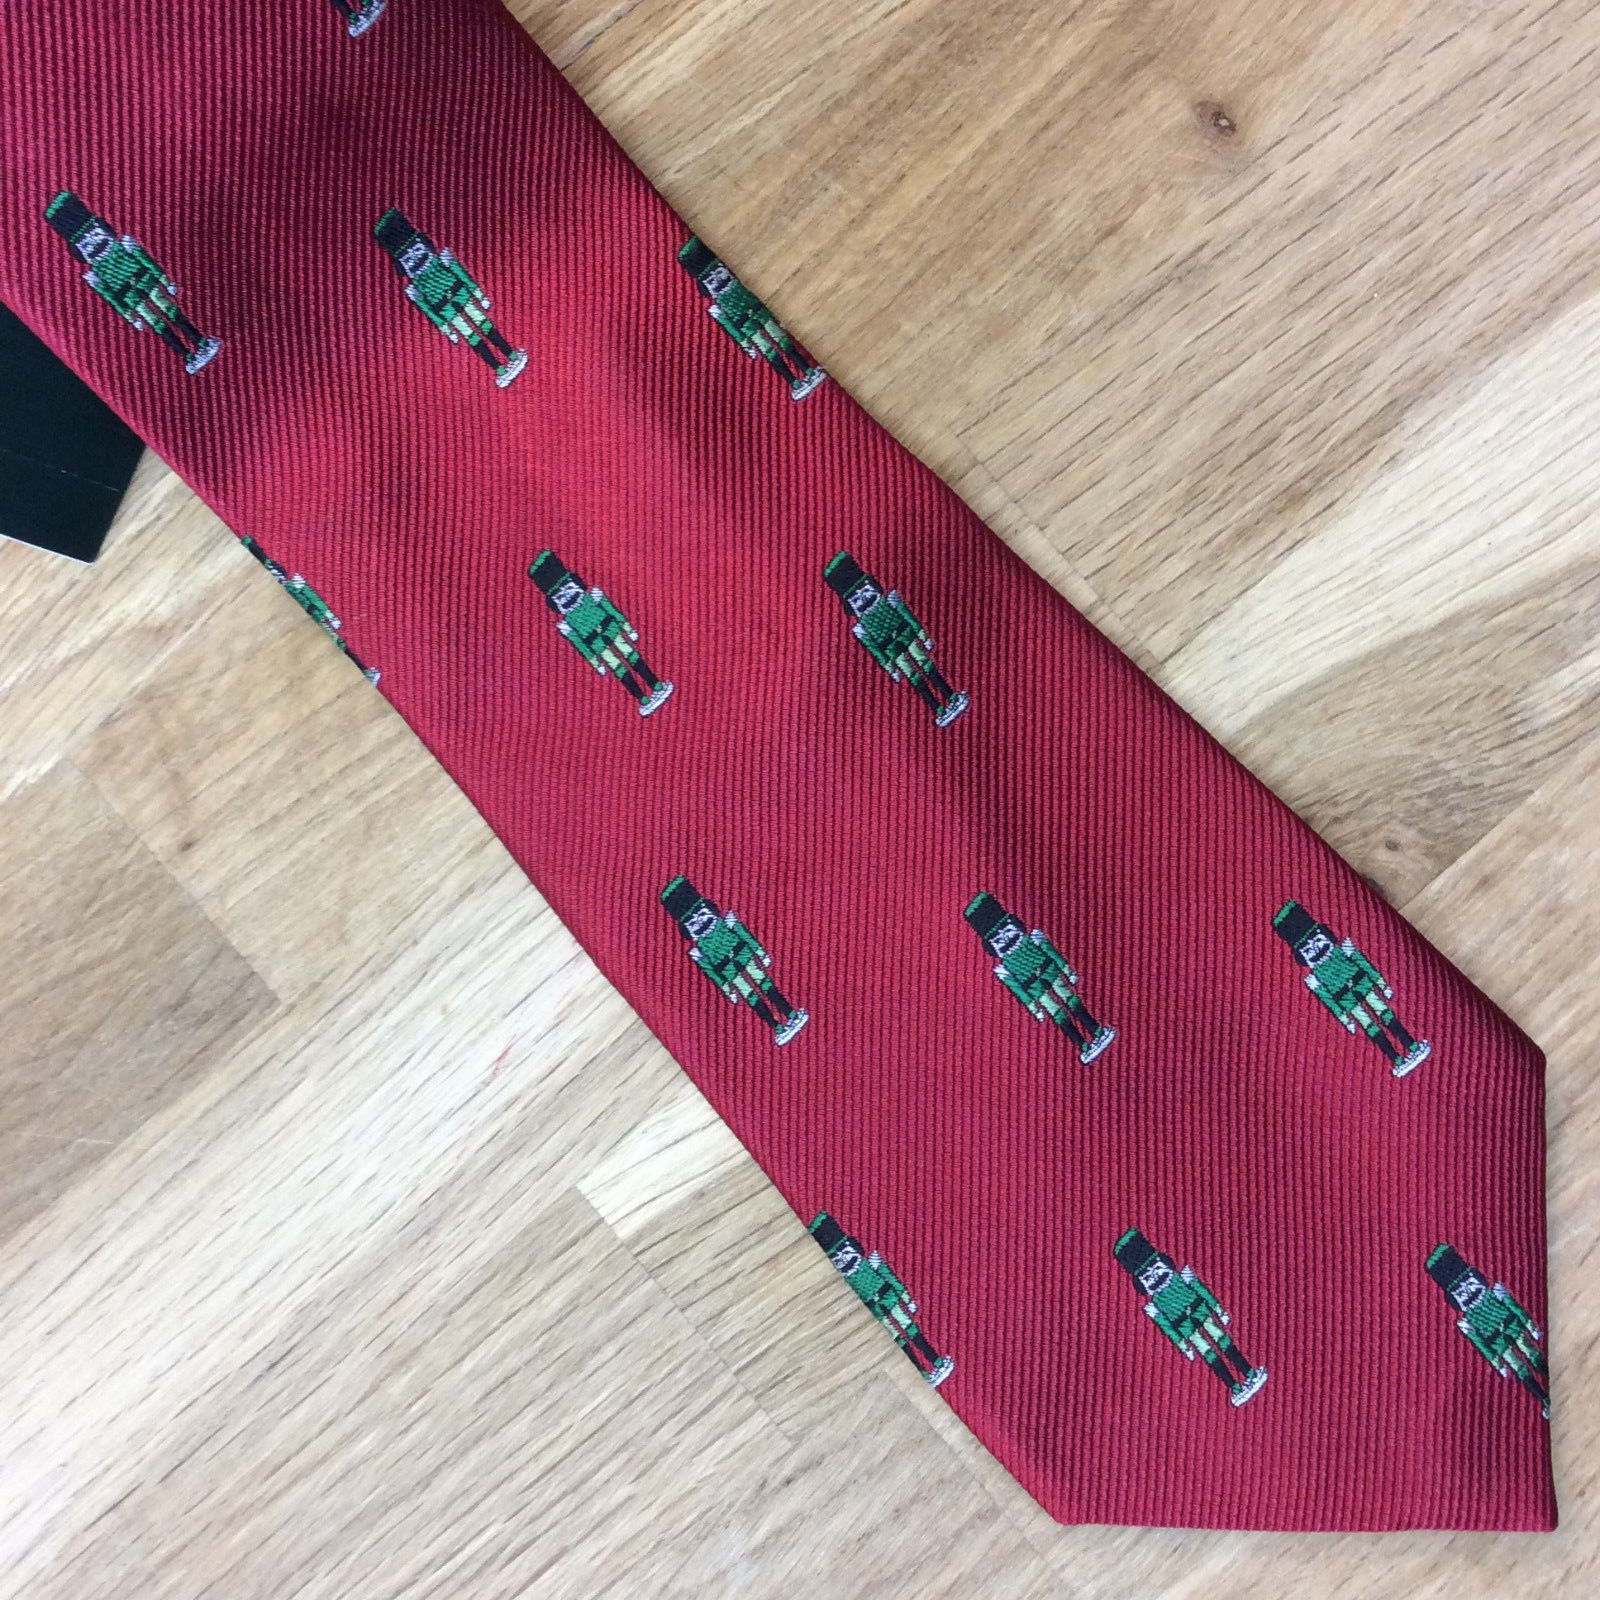 $65.00 Ralph Lauren Men's Toy Soldier Holiday Printed Tie Red